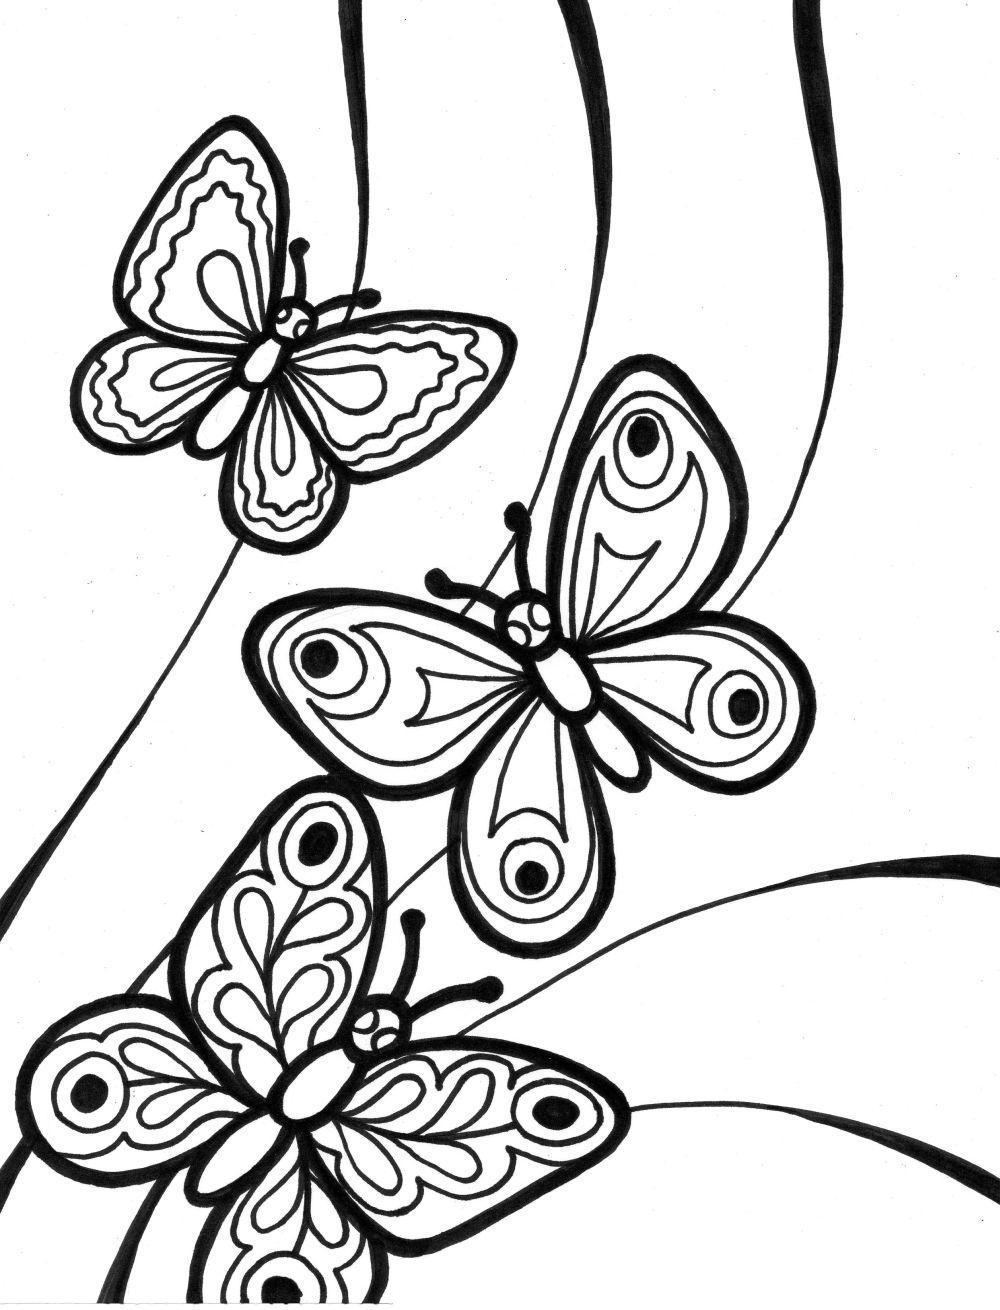 С бабочками Раскраски бесплатно онлайн с цветами